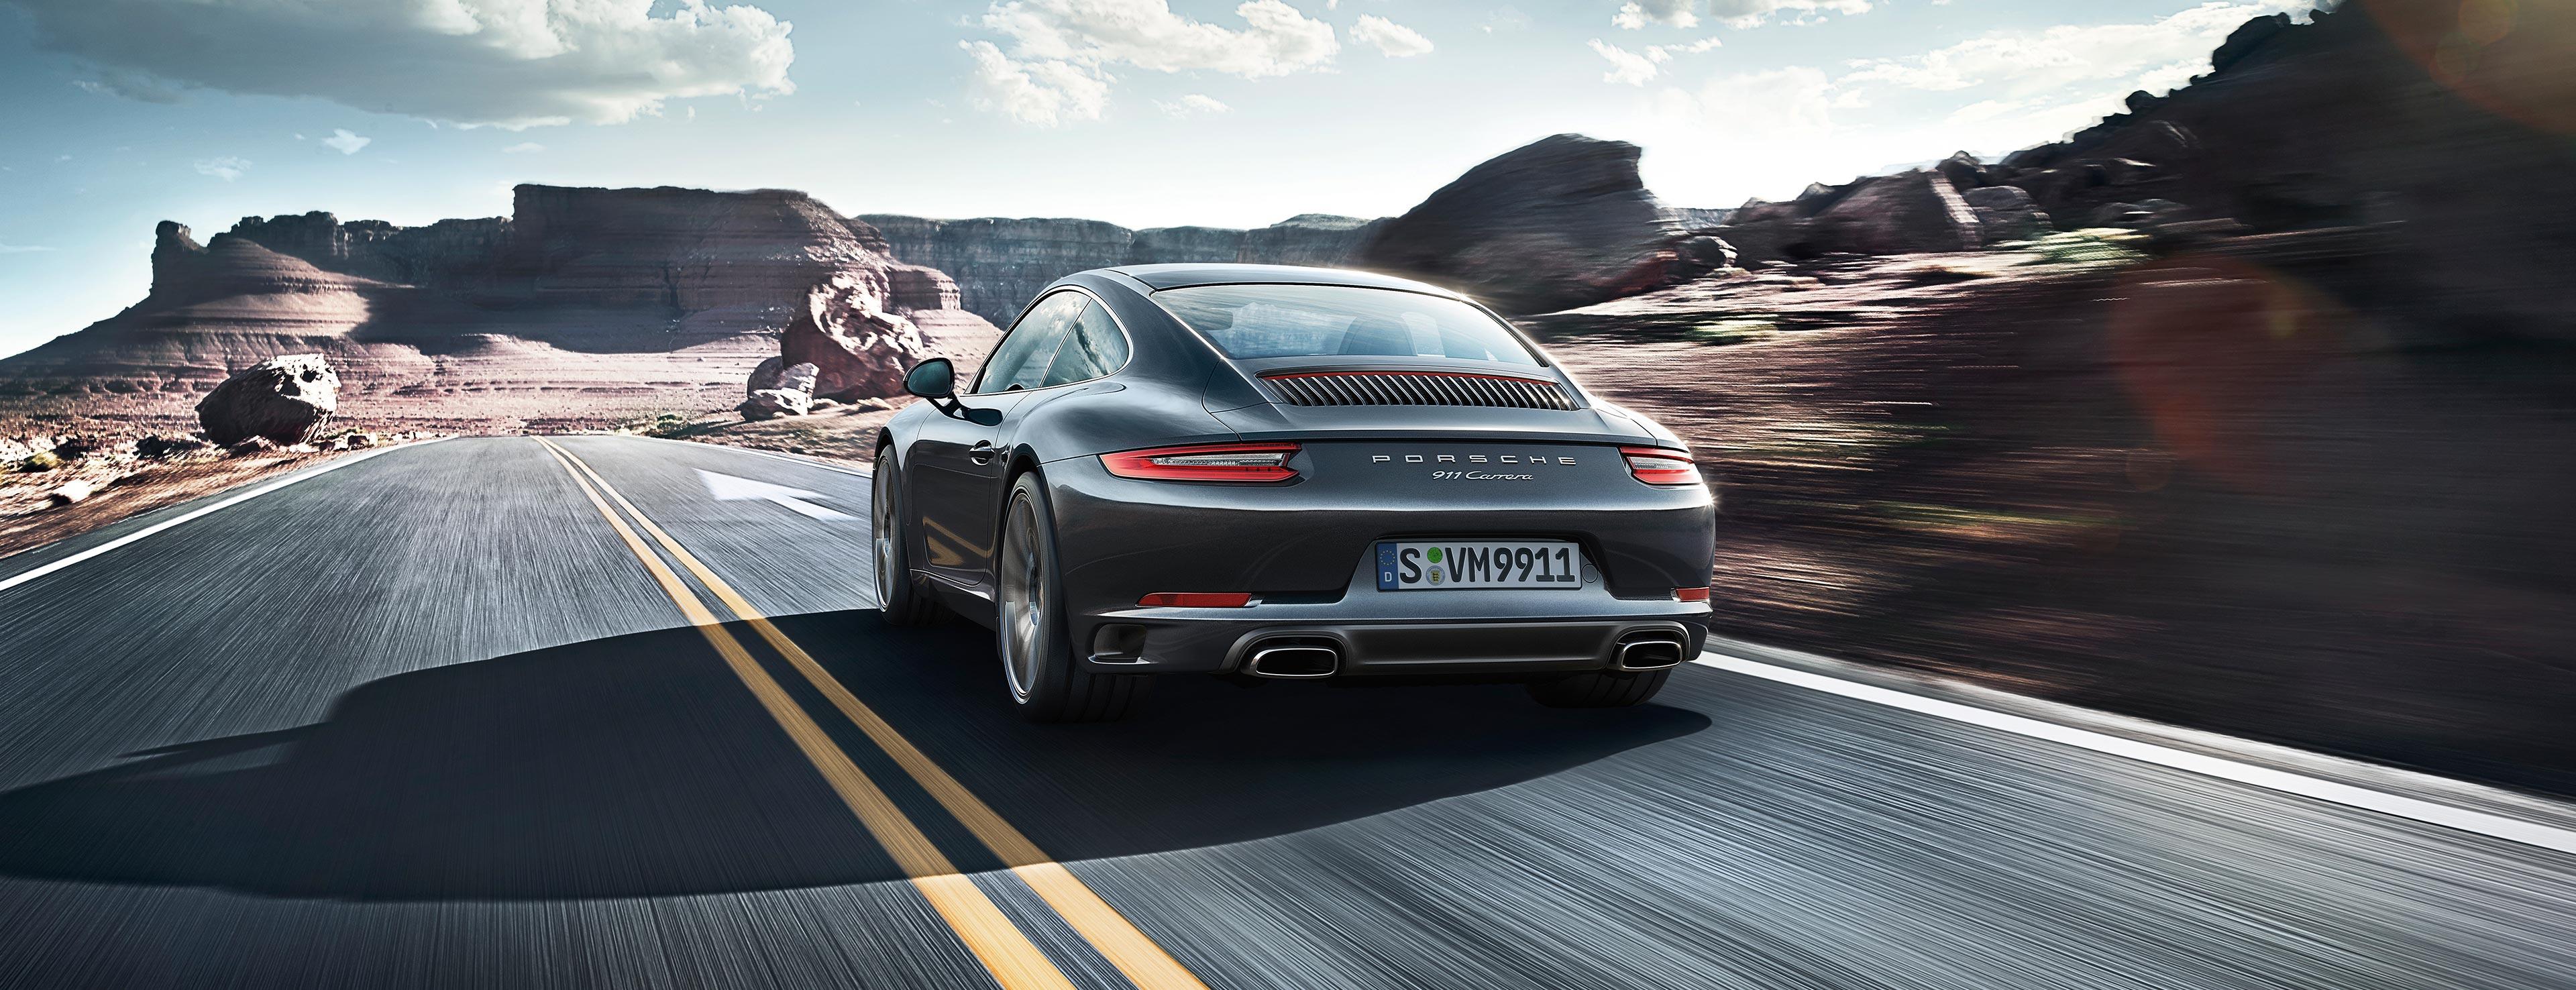 Porsche 911 Carrera Models Porsche Usa